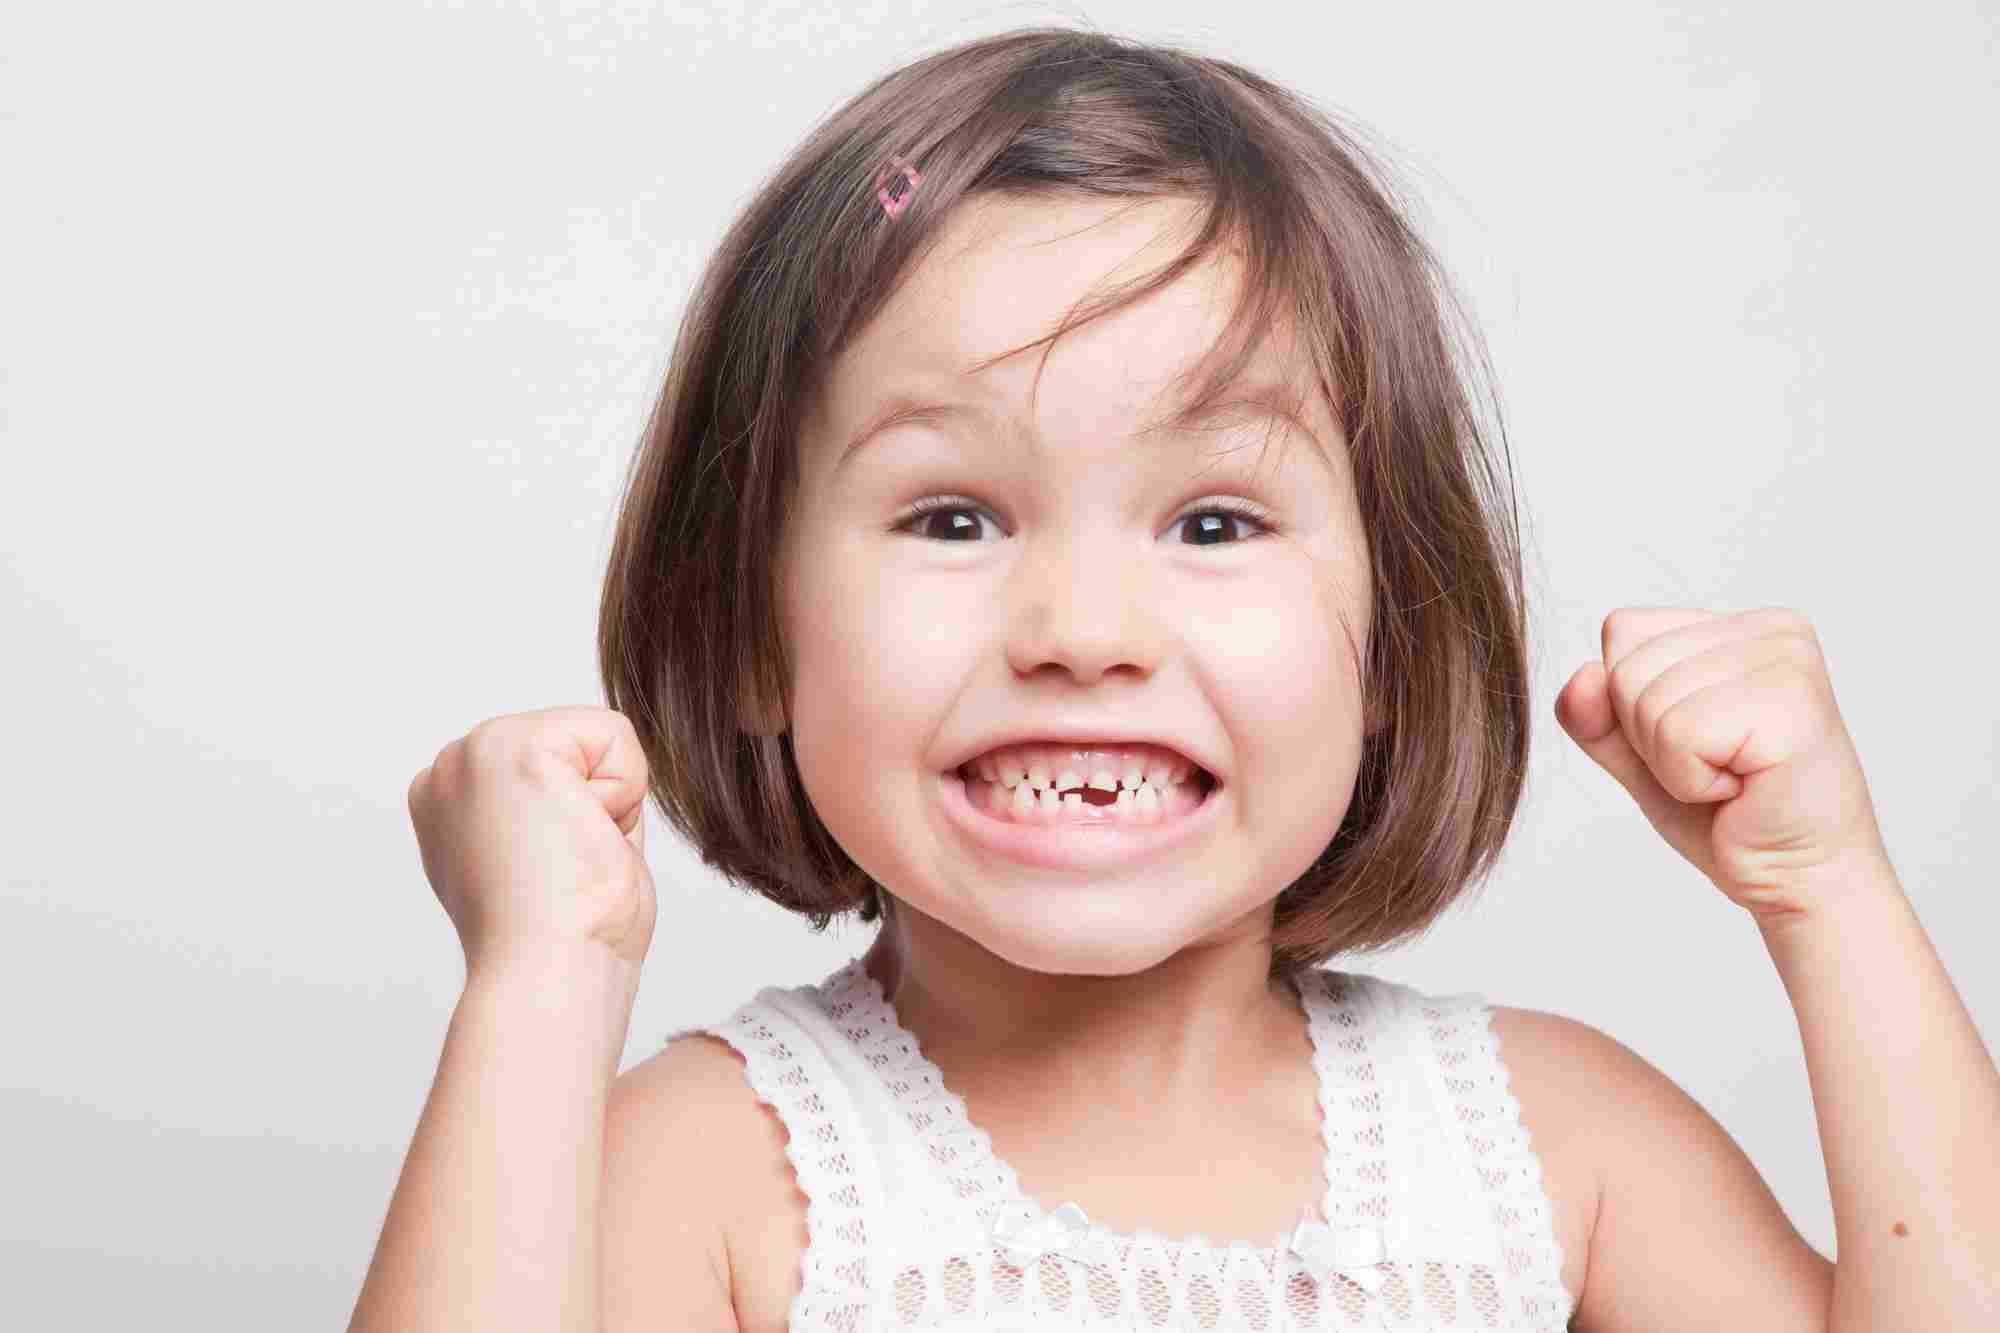 http://dentalplus.ro/wp-content/uploads/2015/08/shutterstock_181949540.jpg